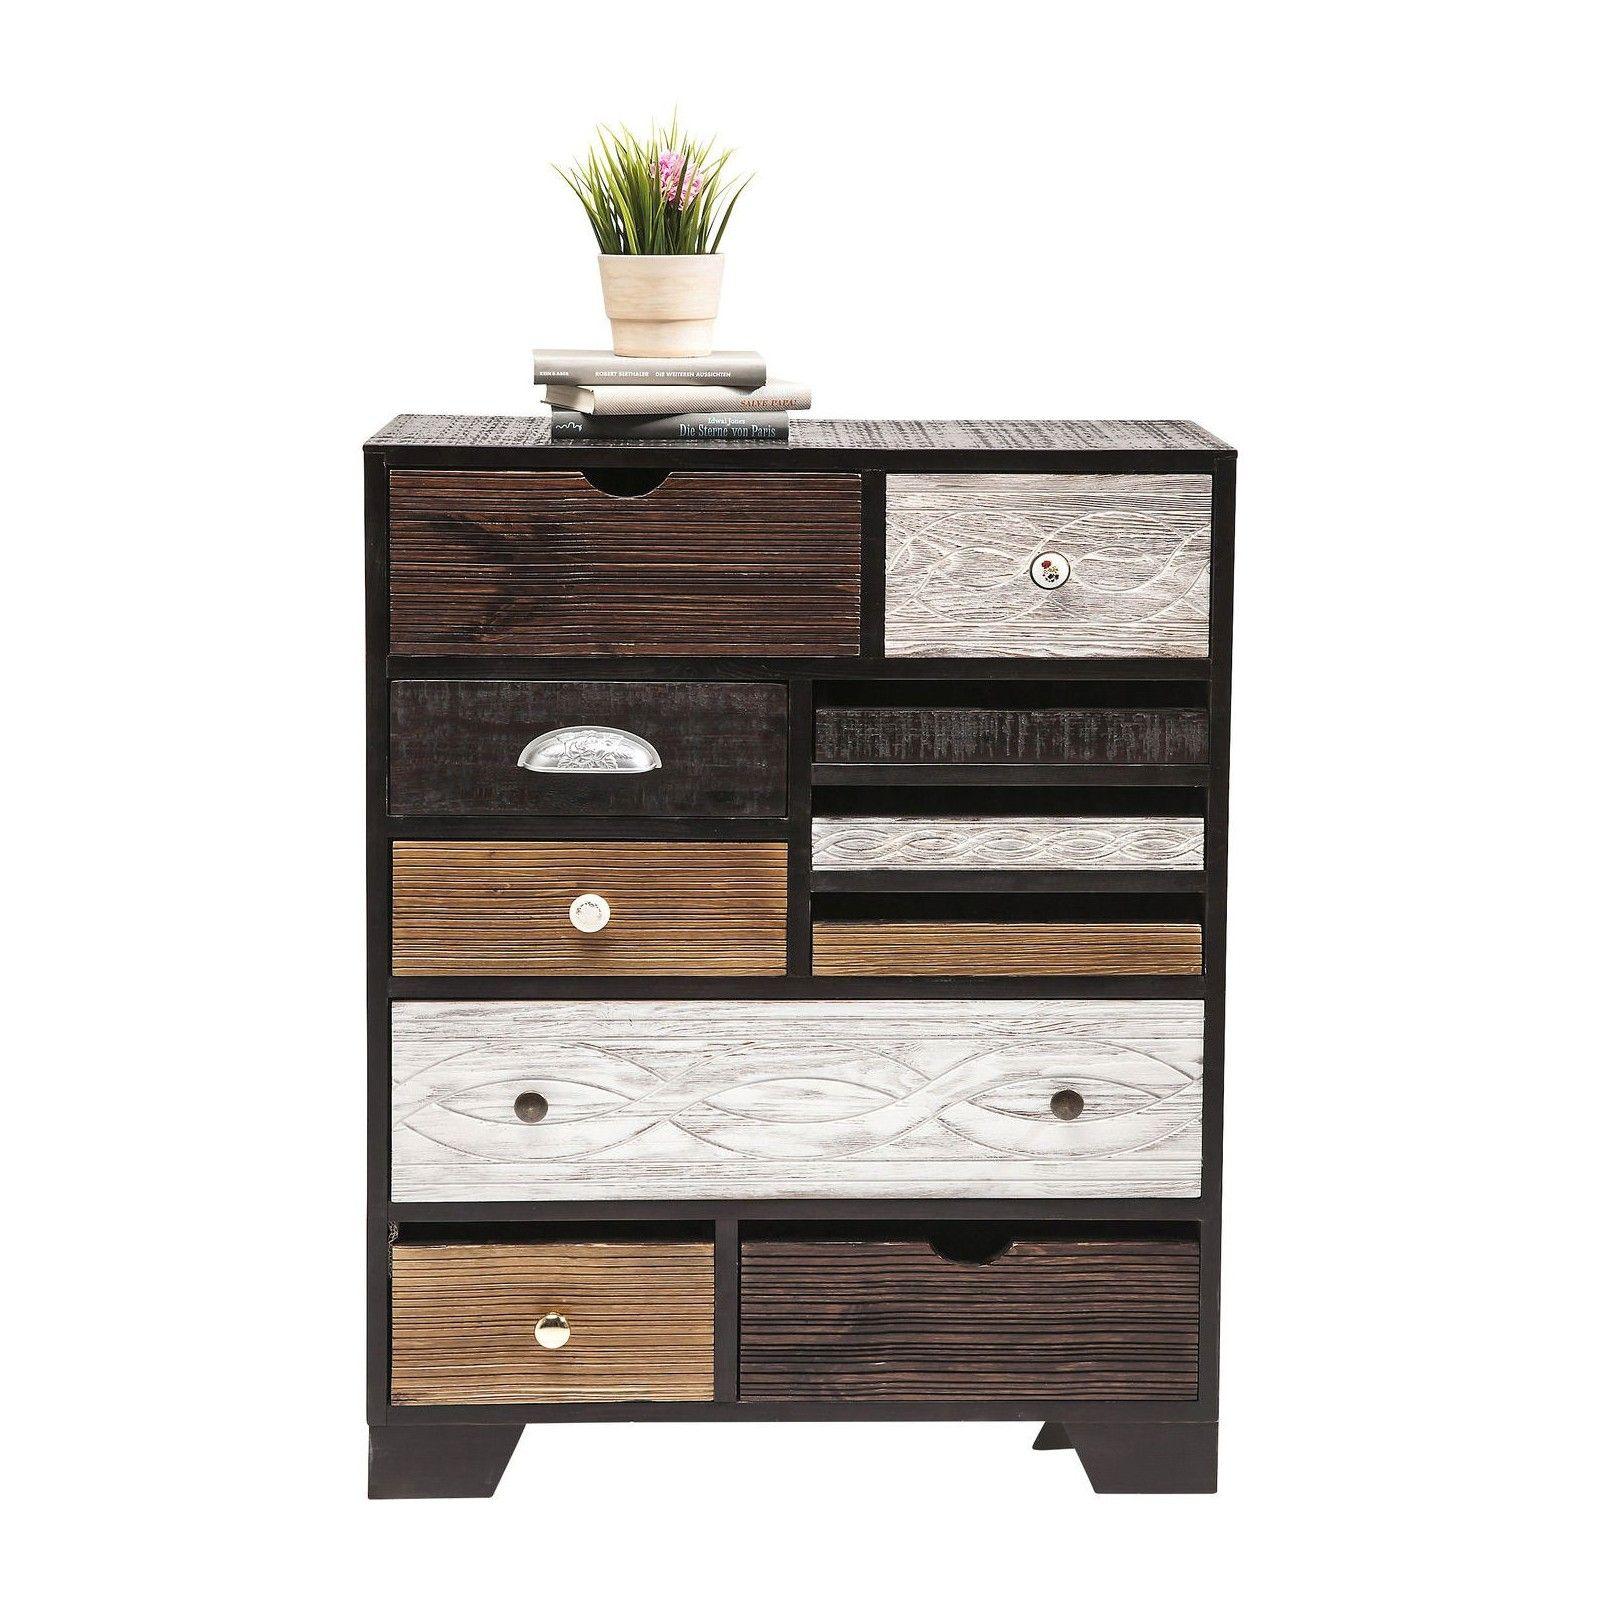 Commode Ethnique En Bois Quinta Kare Design Tiroir Collection De Meubles Mobilier De Salon